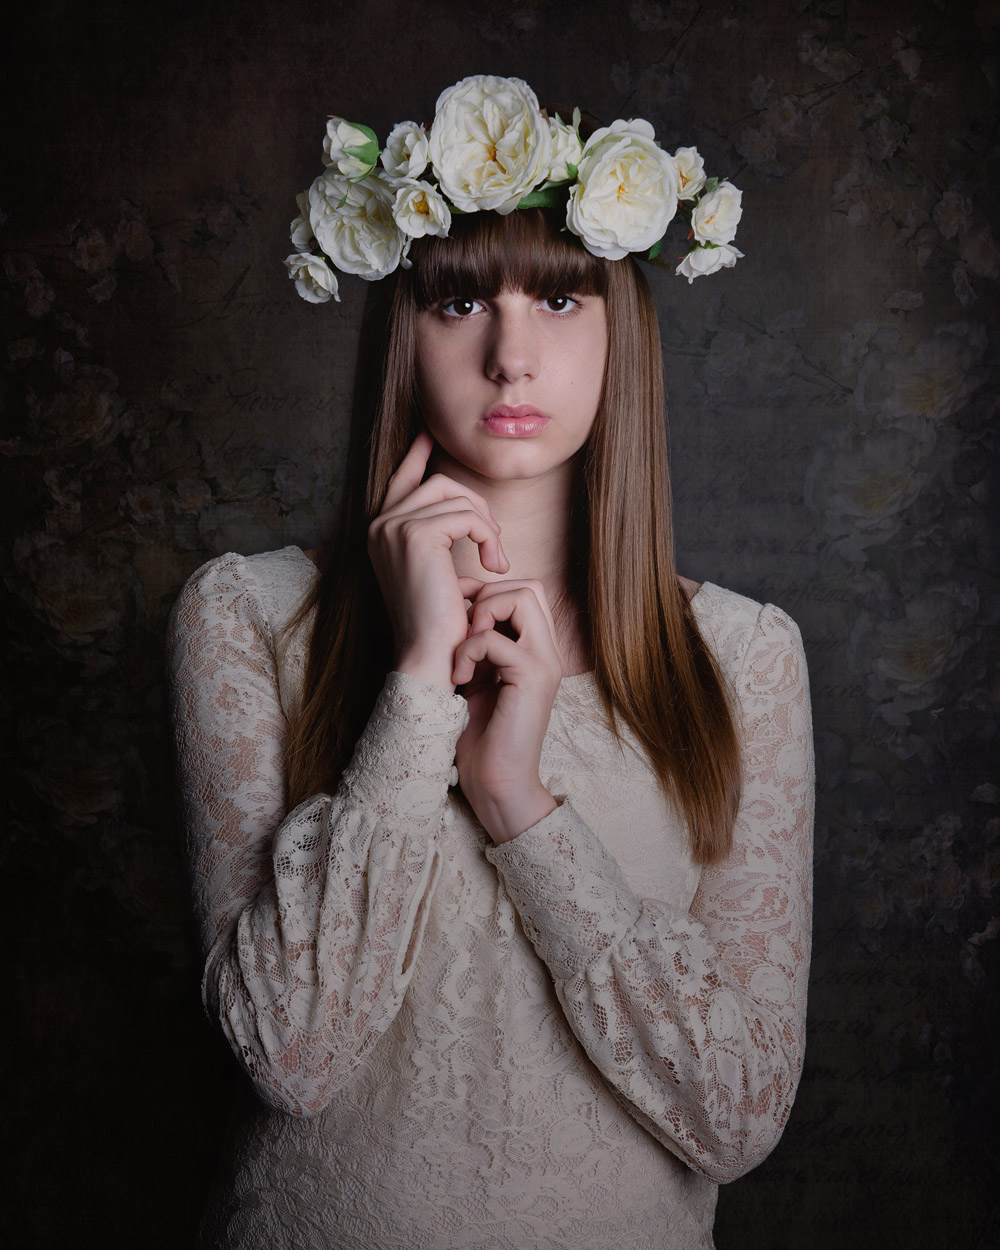 child teen model lace dress fine art award winning photographer Nottingham